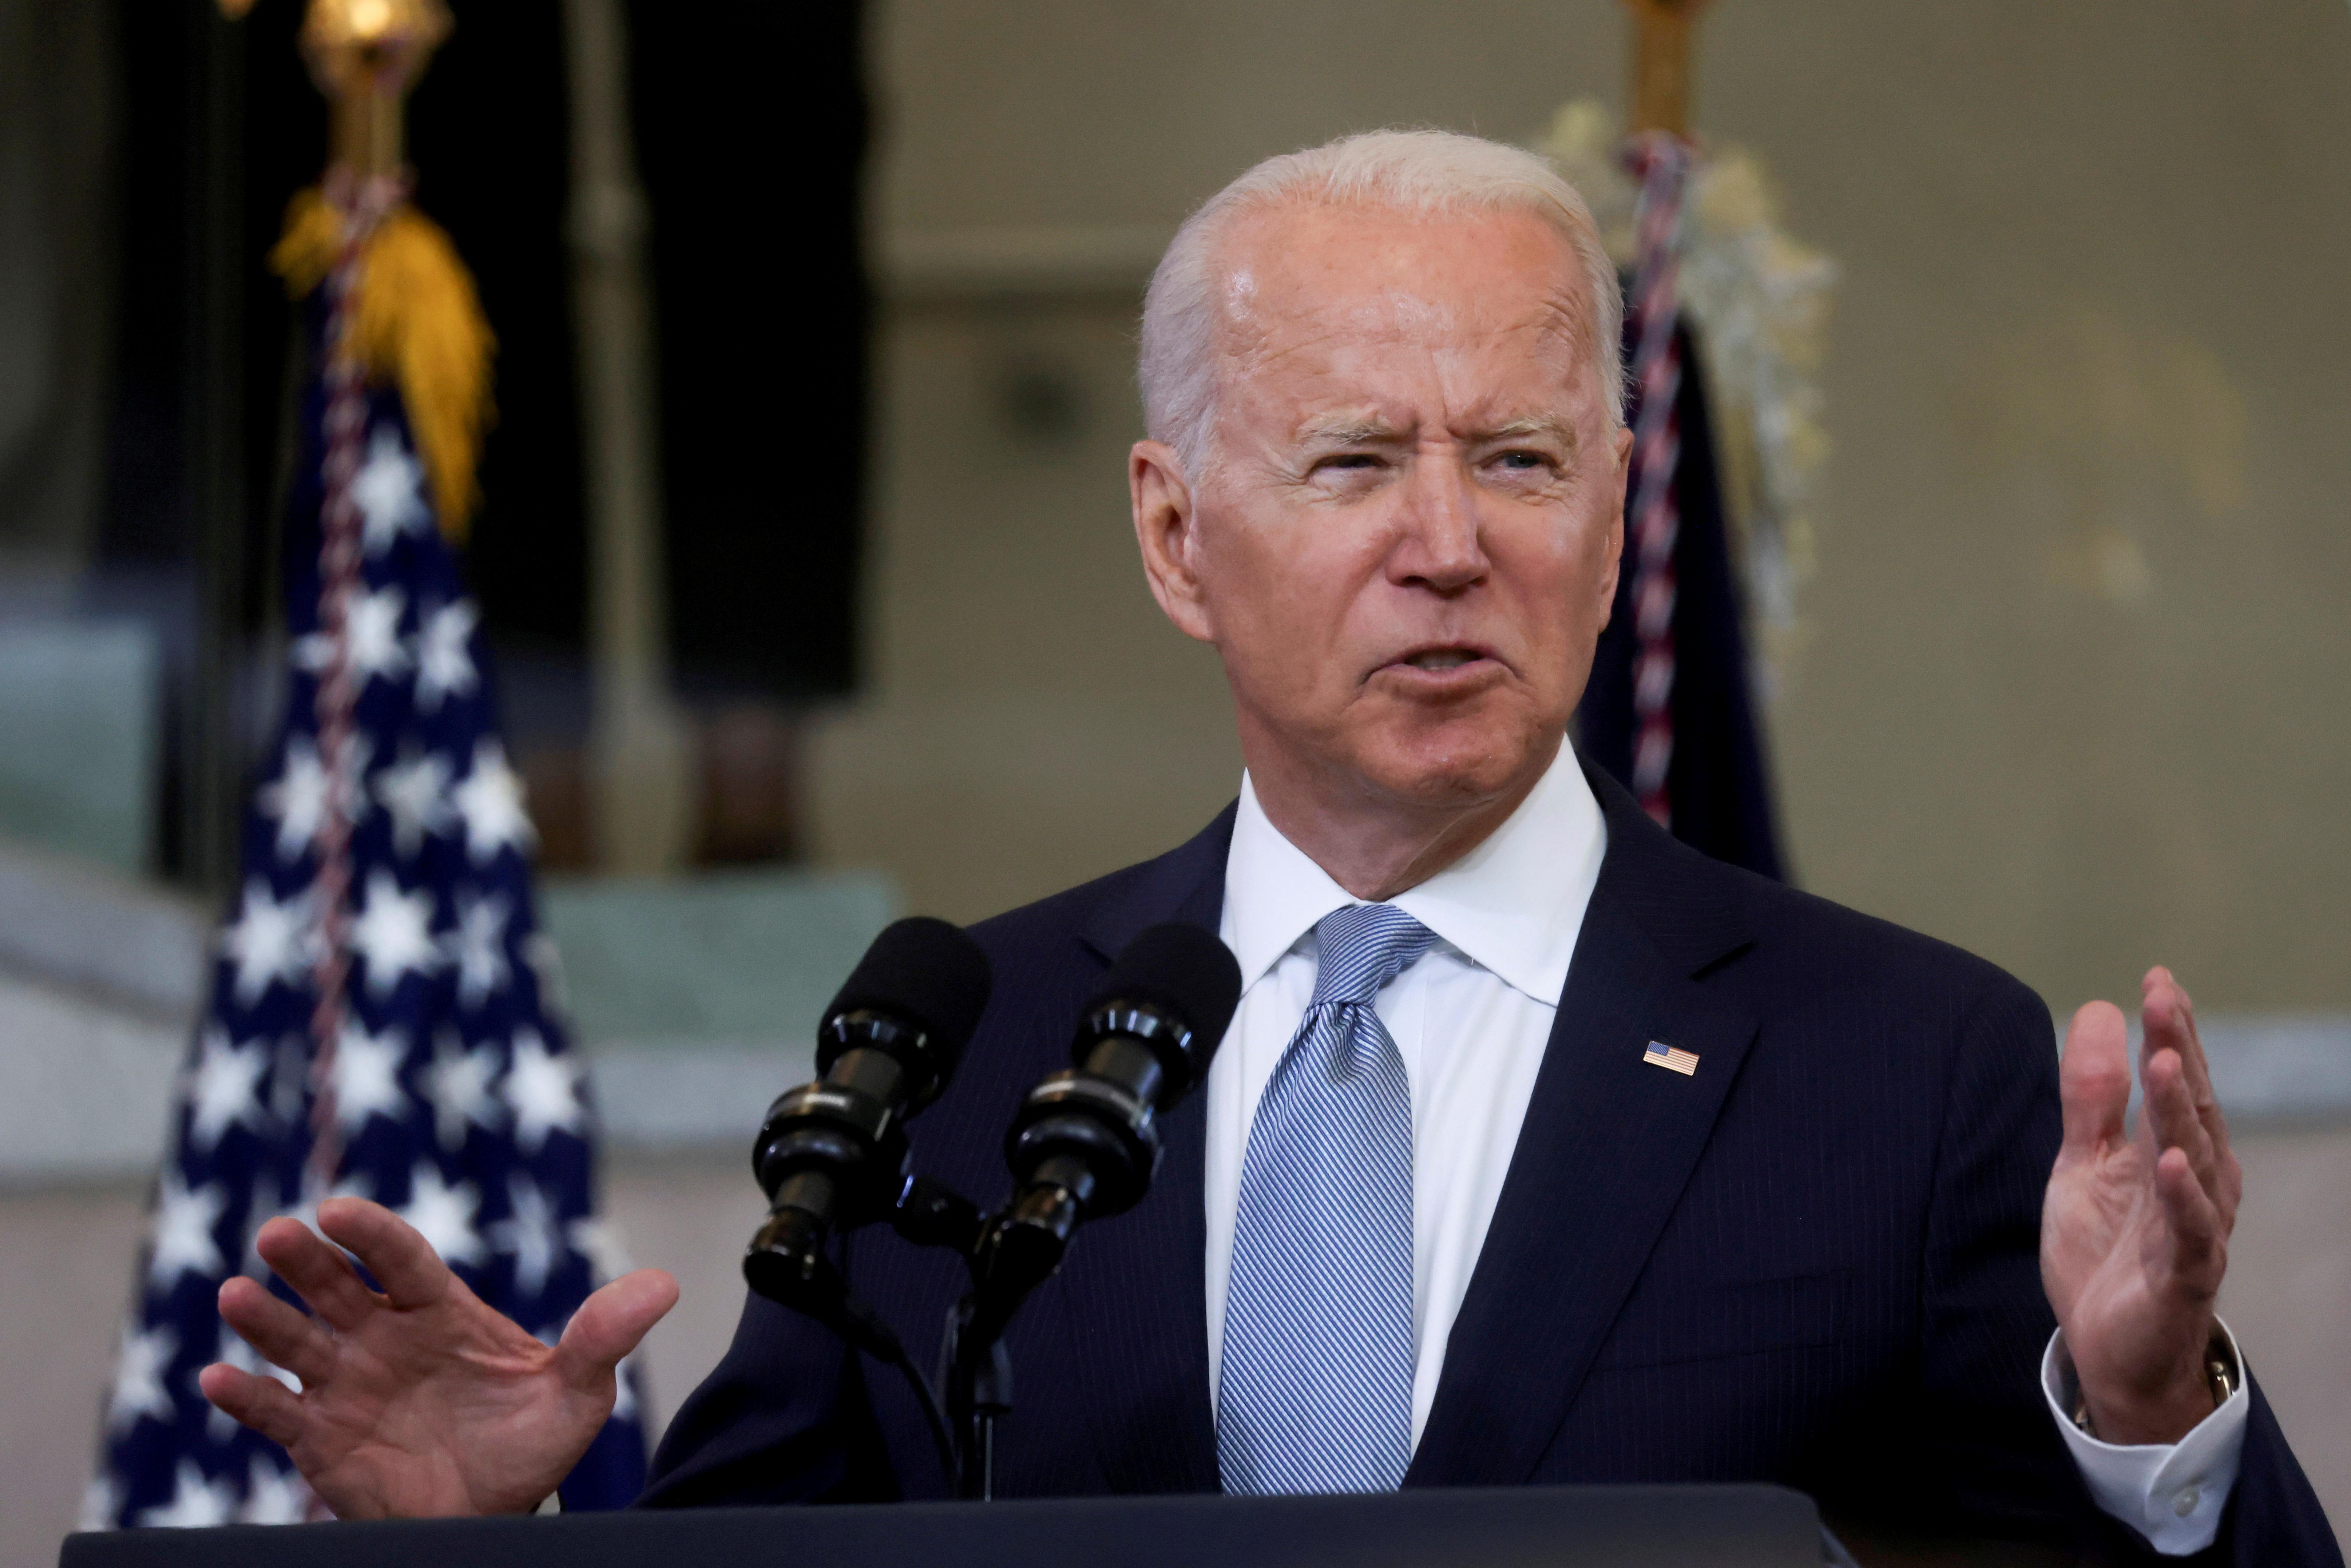 U.S. President Joe Biden delivers remarks in a speech at National Constitution Center in Philadelphia, Pennsylvania, U.S., July 13, 2021. REUTERS/Leah Millis